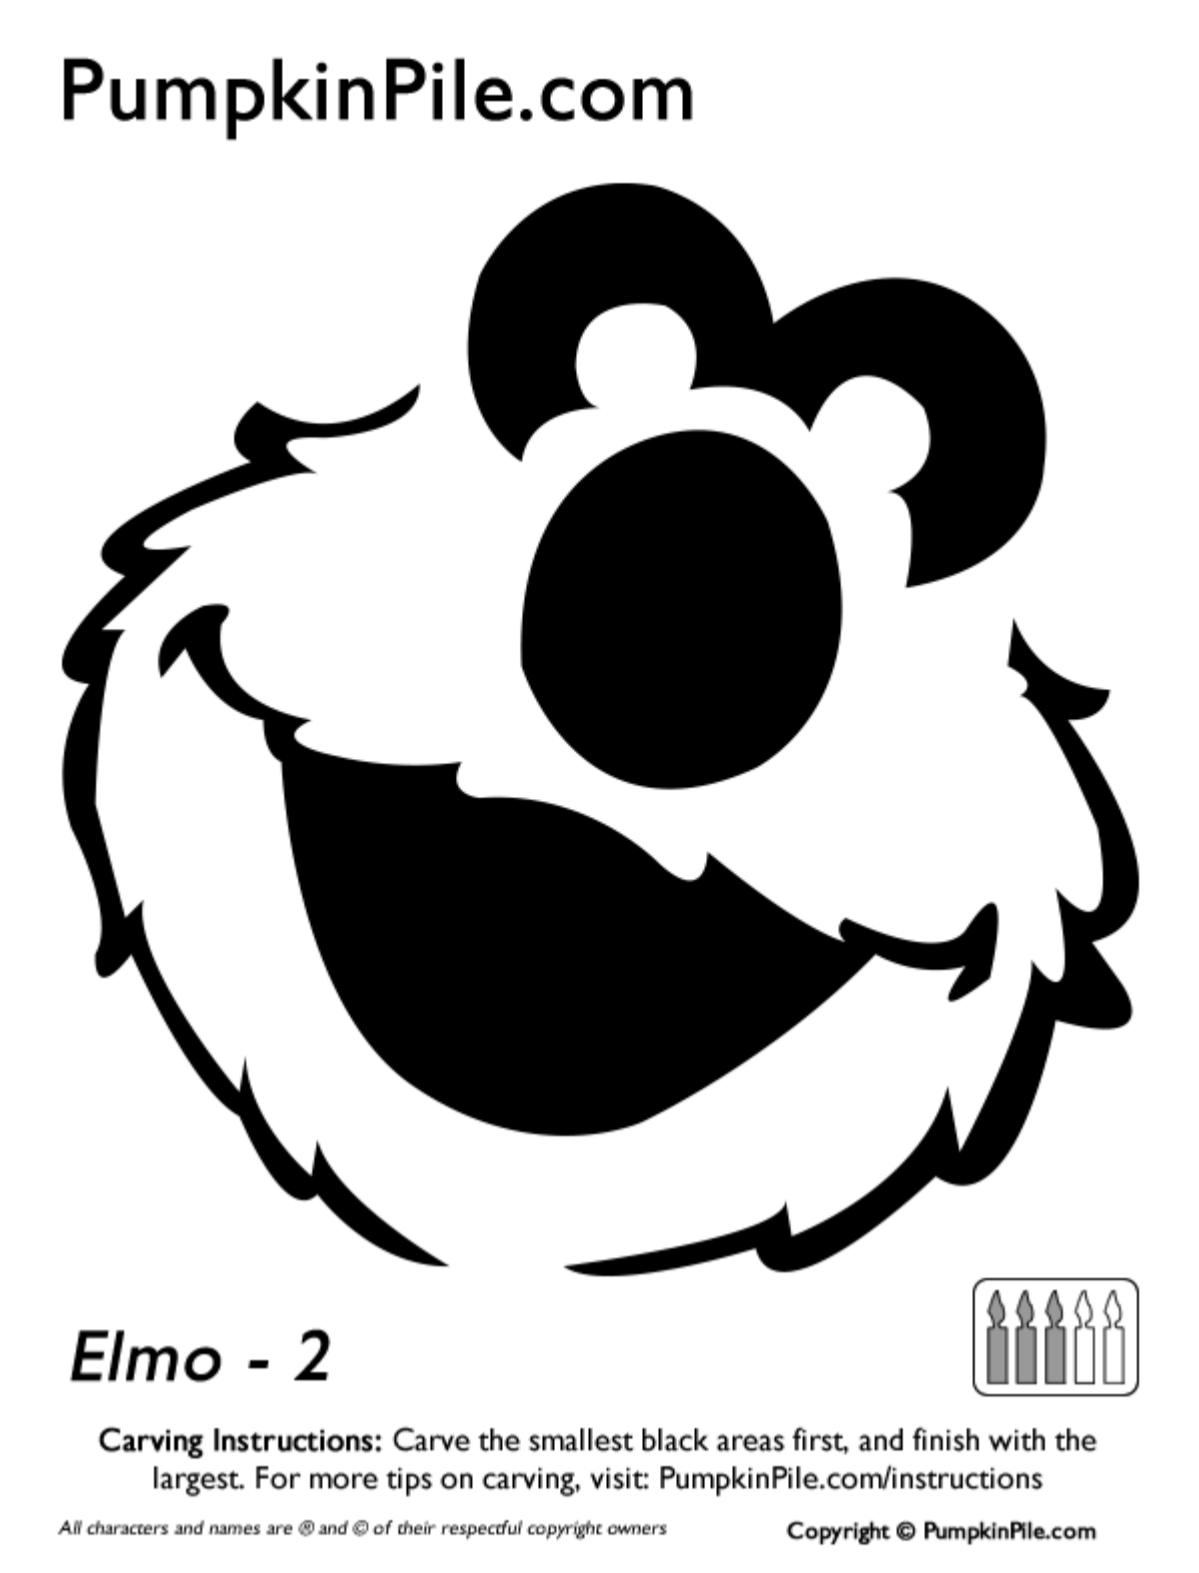 Elmo Pumpkin Carving Stencils Free Printable - 4.7.ybonlineacess.de • - Free Elmo Pumpkin Pattern Printable